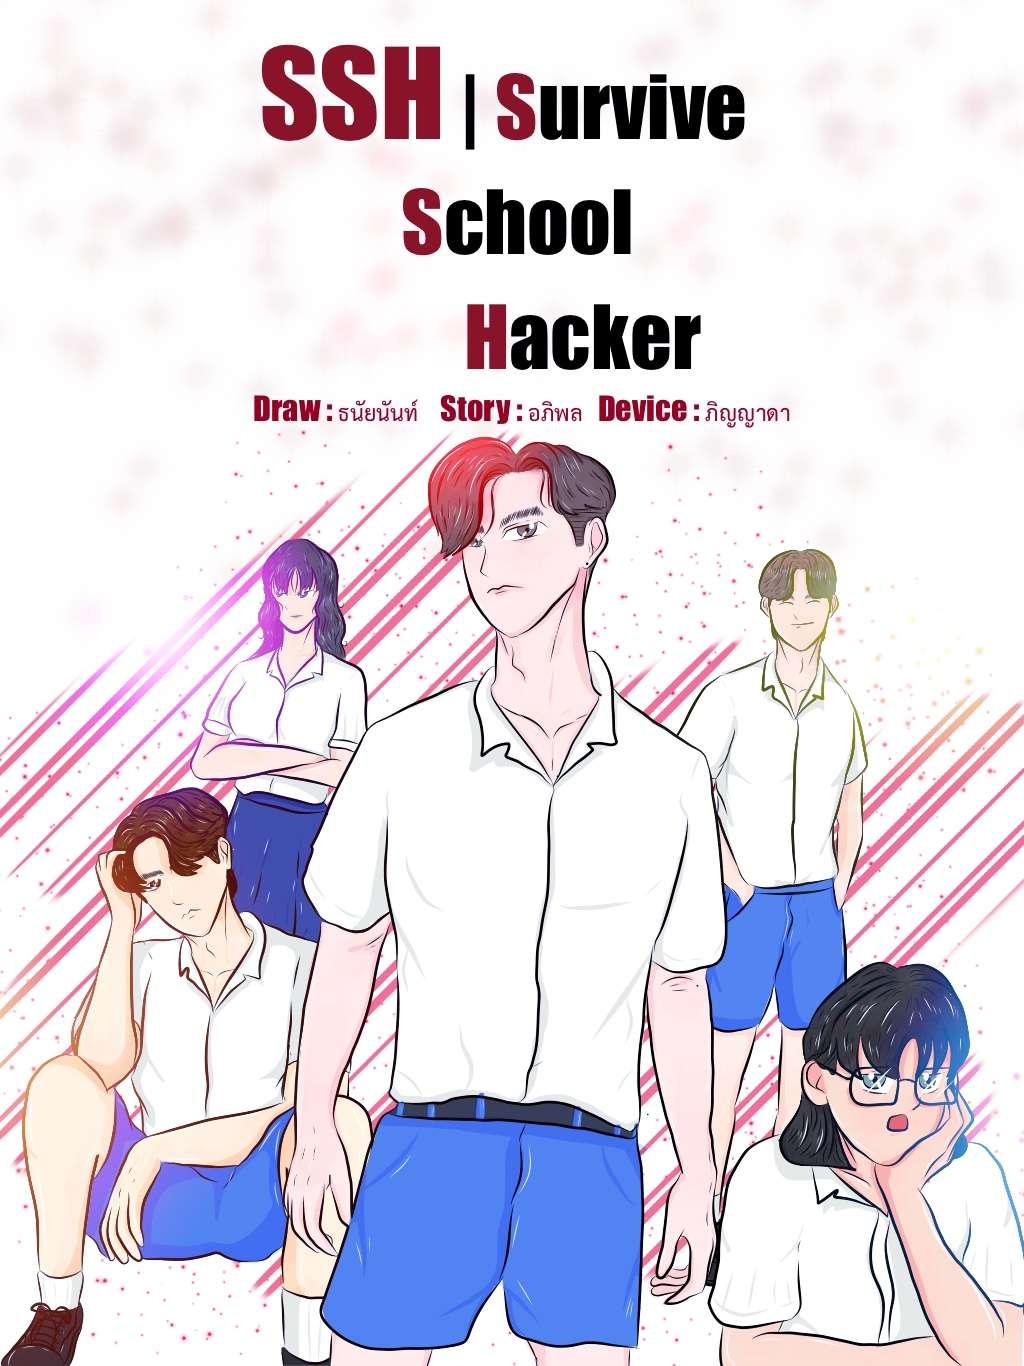 SSH| Survive School Hacker เอาตัวรอดโรงเรียนสายแฮก!!